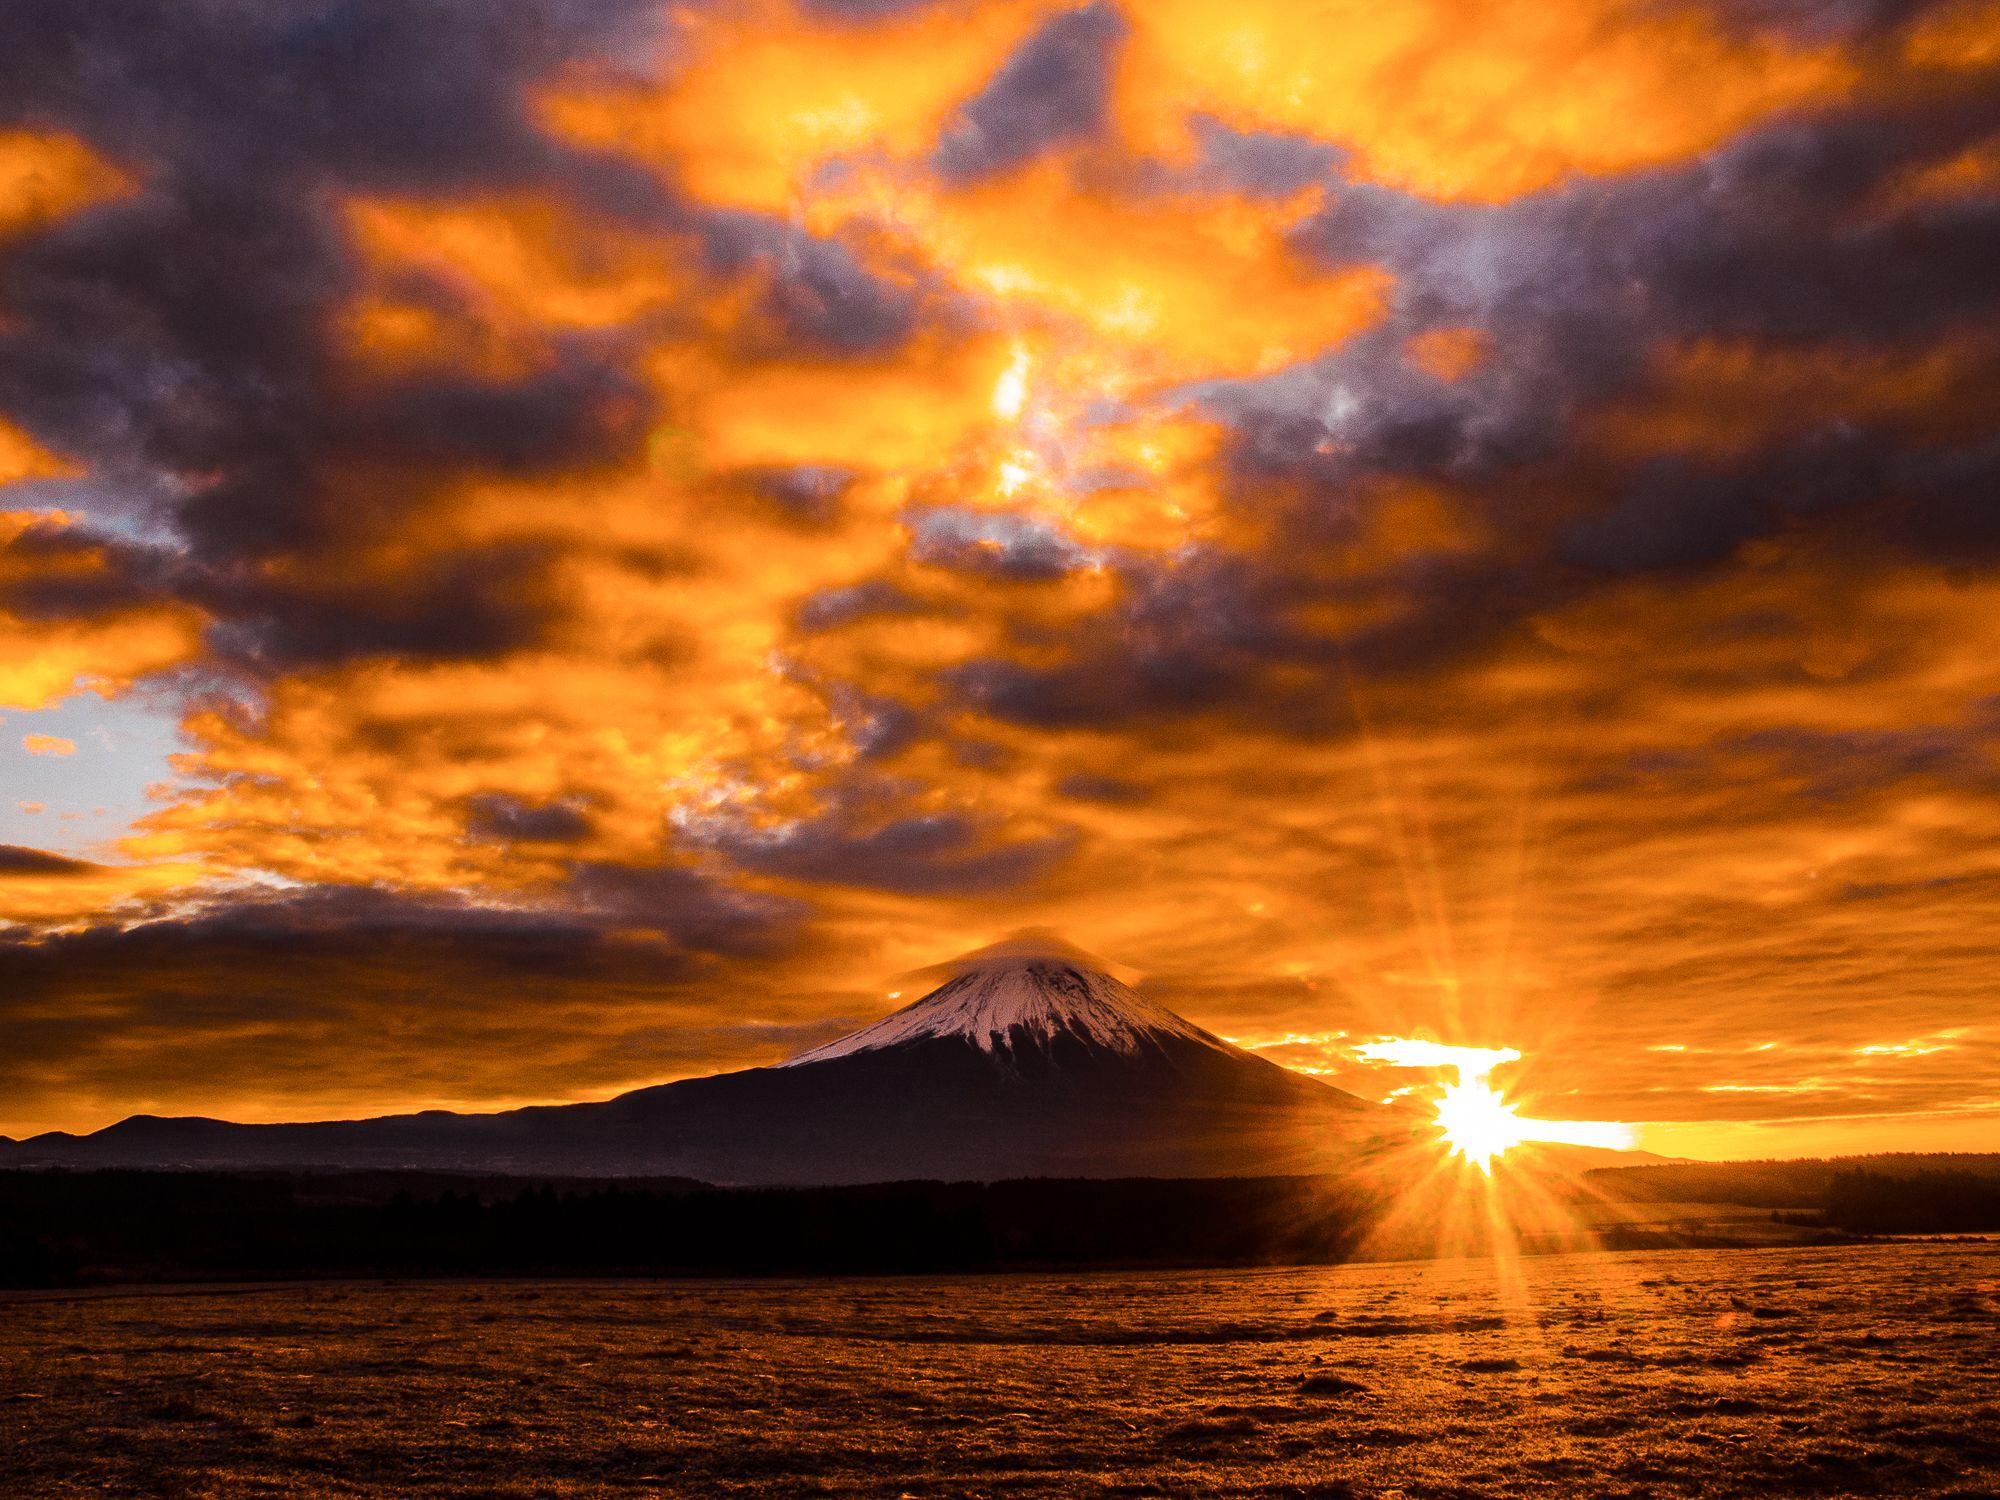 Photo by : Hamano Toru . Follow us for amazing posts! #PASHADELIC #FUJIdelic . . #mtfuji #fujiyama #fujisan #富士山 #富士 #山 . #igers #ig_japan #japan #japan_of_insta #japanphoto #landscape #landscapephotography #mountain #mountains #mountainphotography #nature #naturephotography #photography #photooftheday